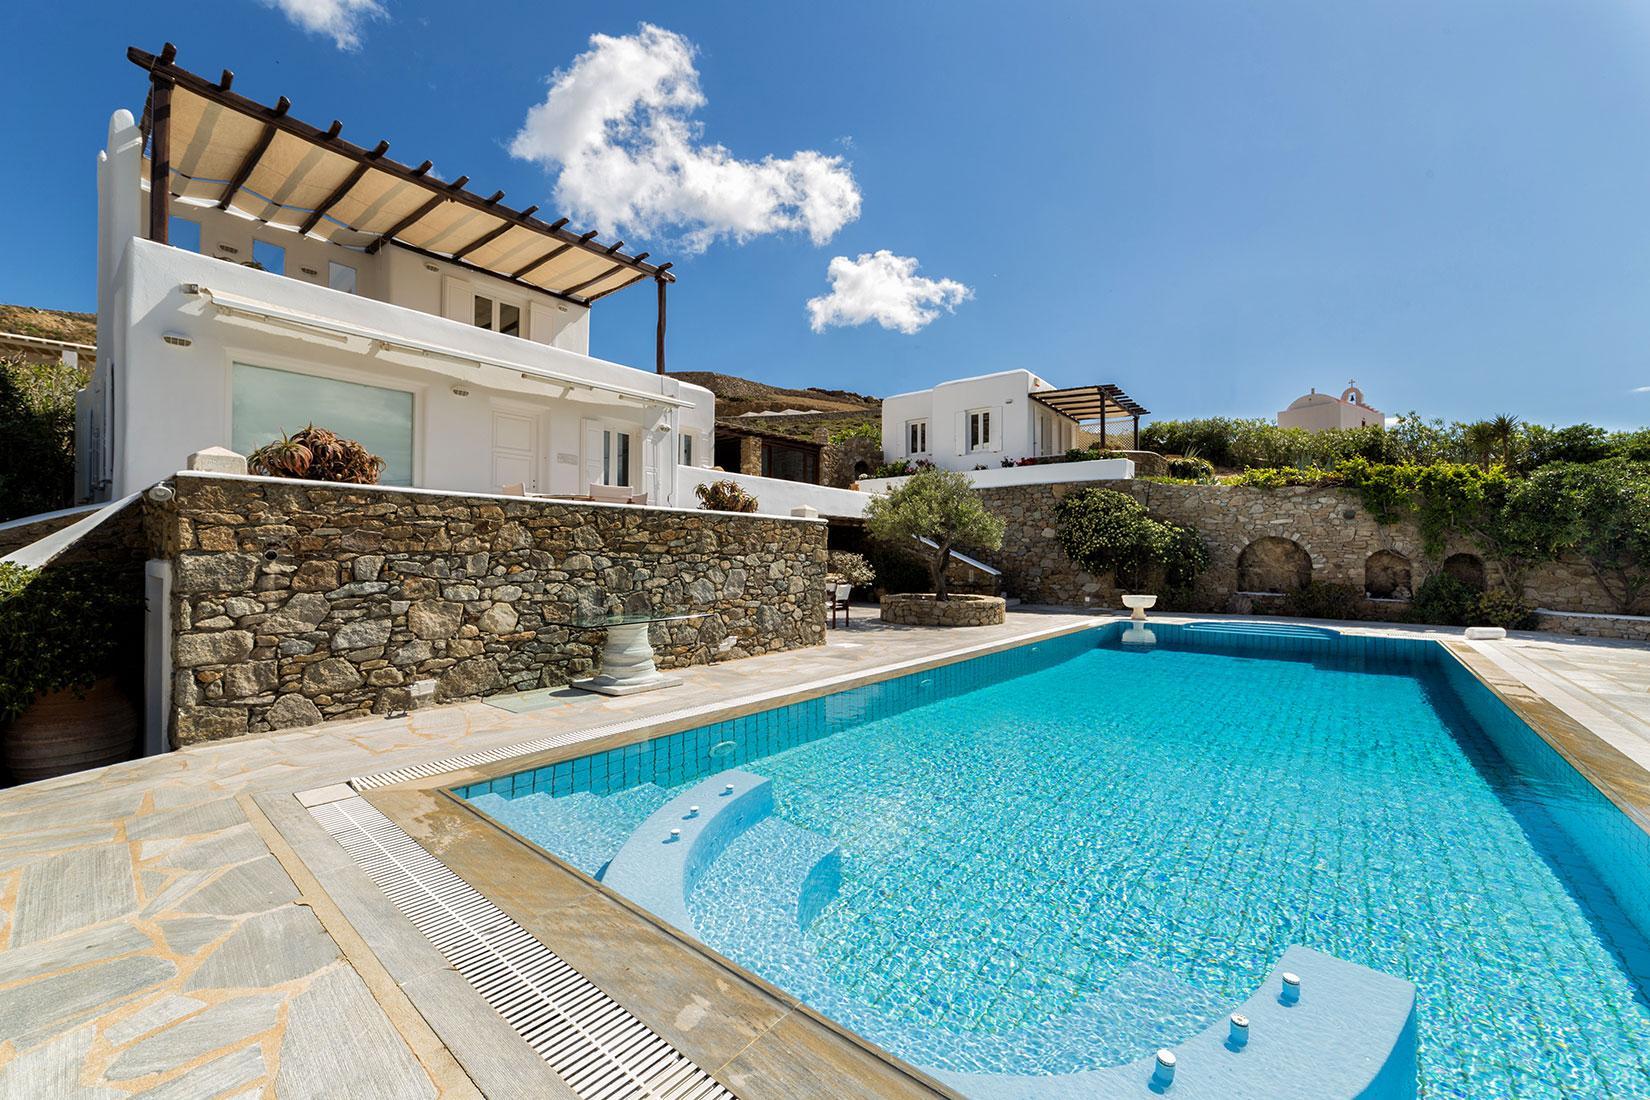 Apartment HOUSE OF THE SUN The Galaxy Mykonos villa photo 1411921